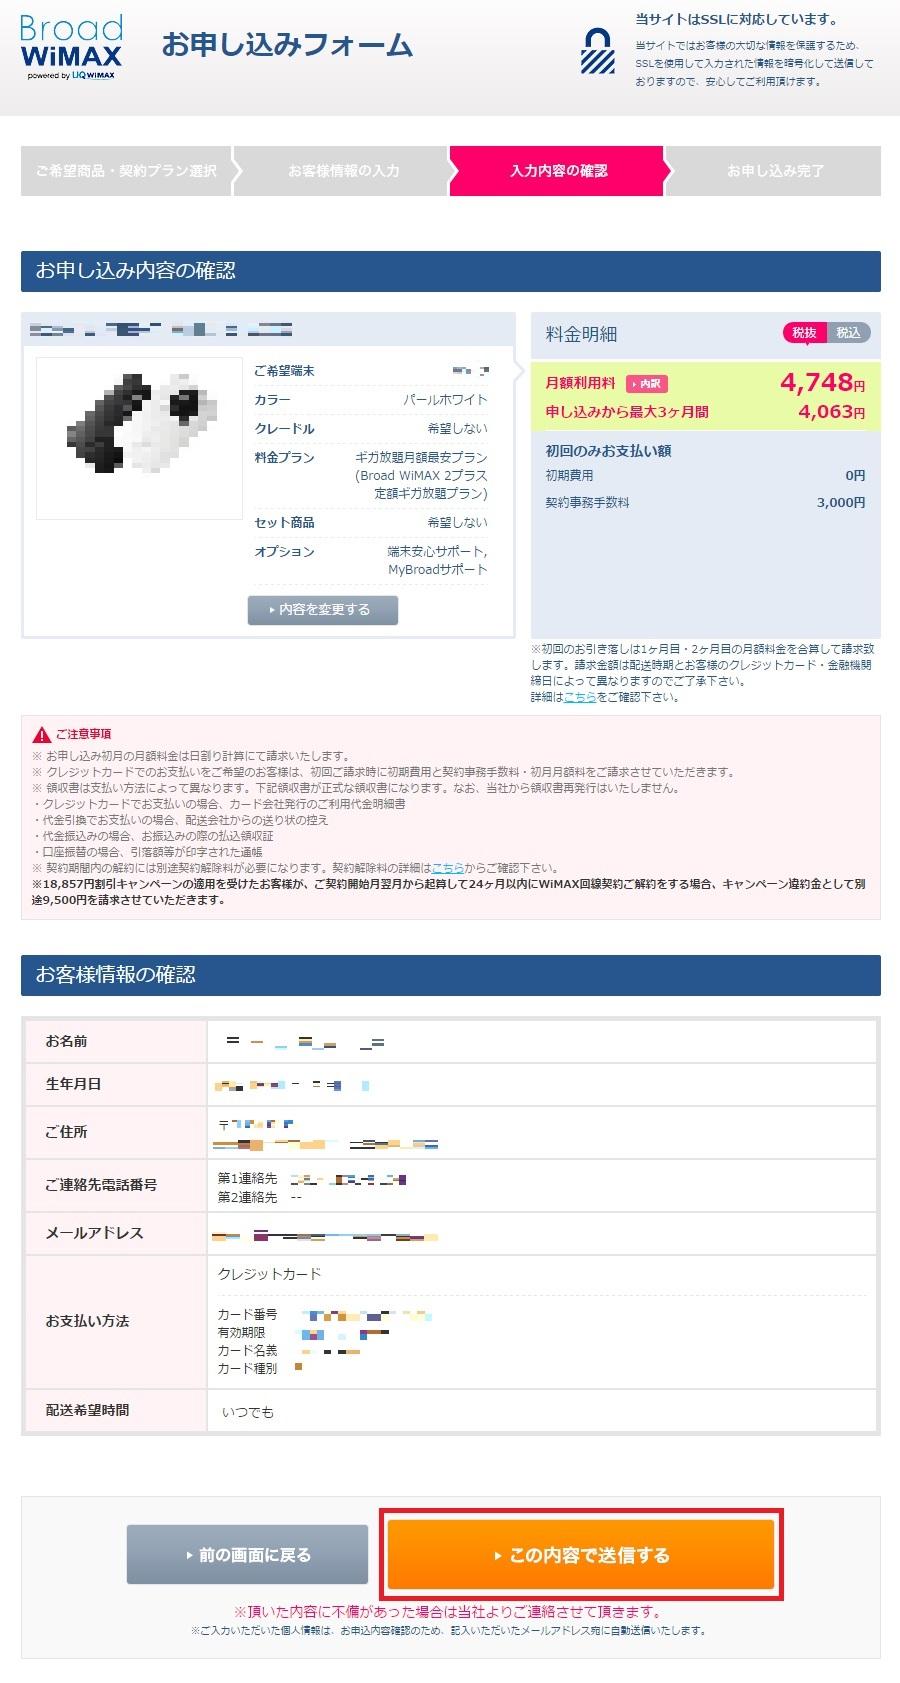 WiMAXマスターBroadWiMAX契約方法と手順22016年8月11日